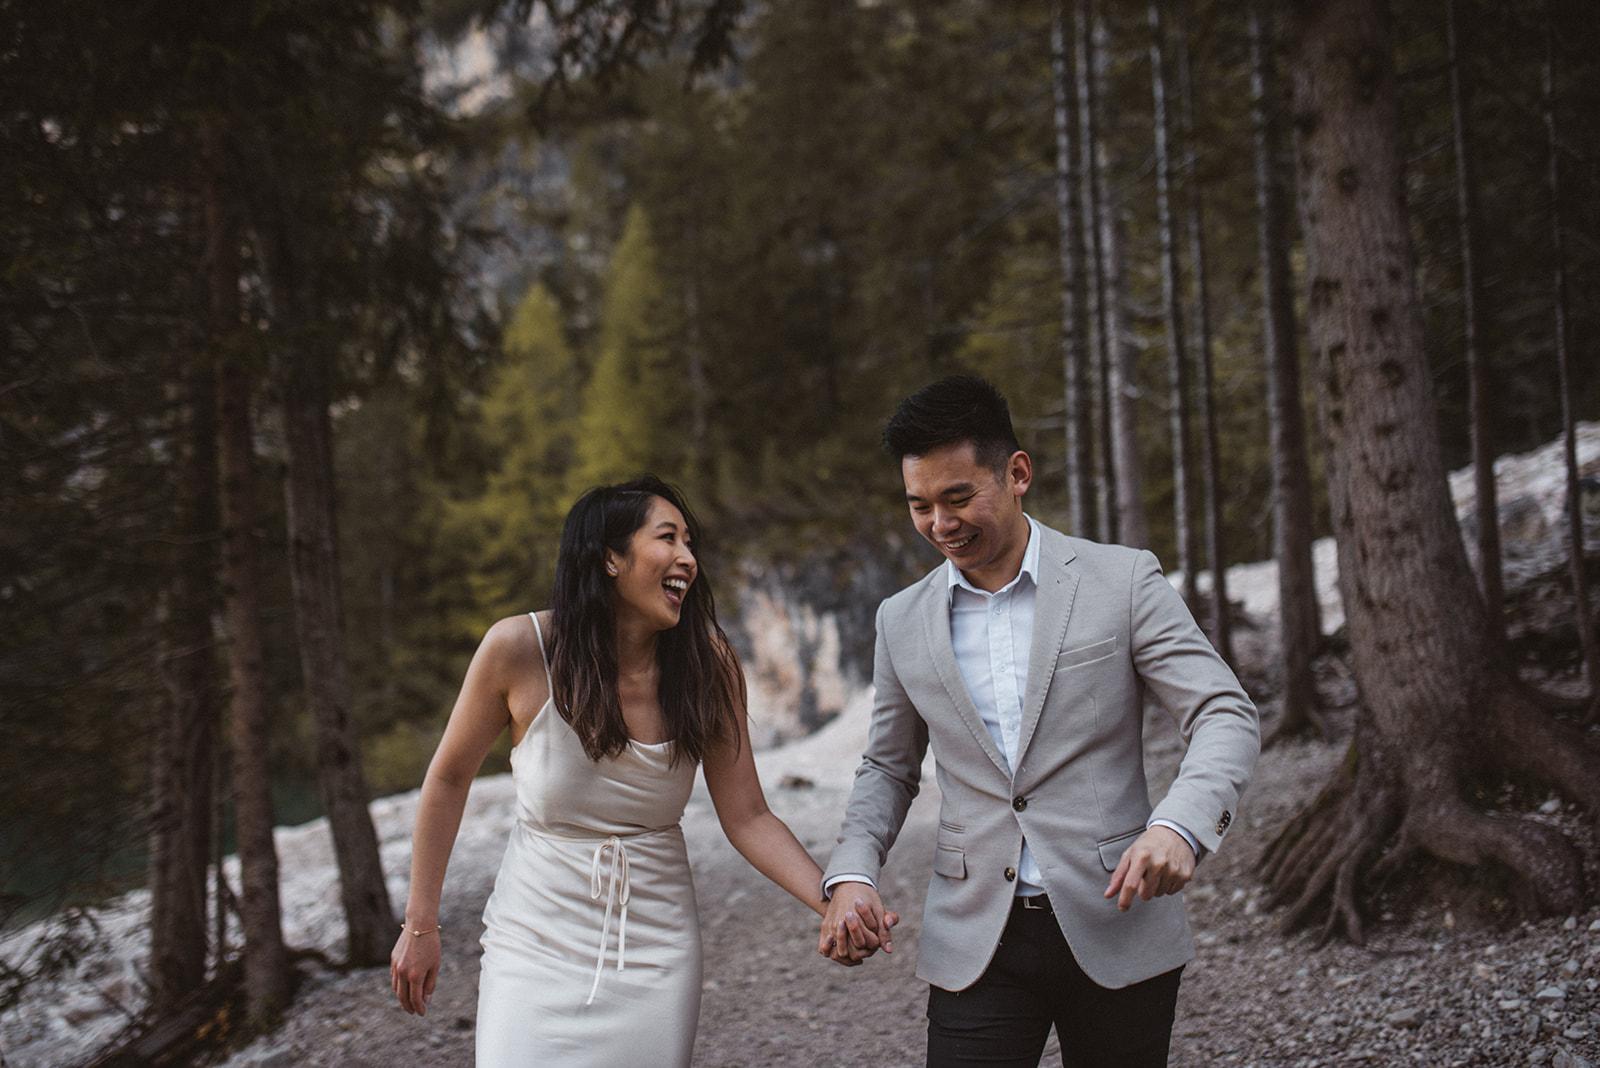 Pragser Wildsee Wedding Photographer